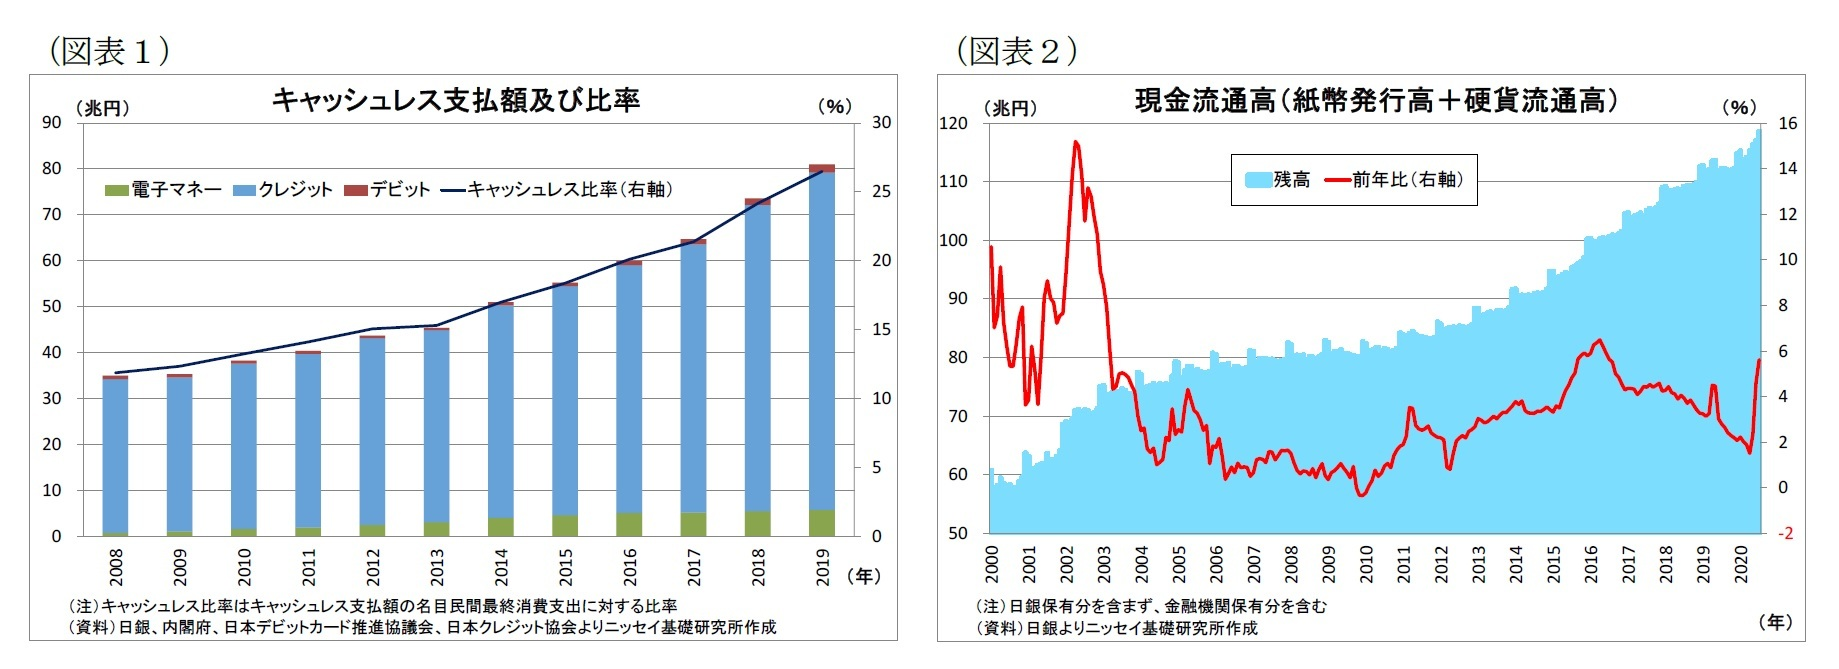 (図表1)キャッシュレス支払額及び比率/(図表2)現金流通高(紙幣発行高+硬貨流通高)